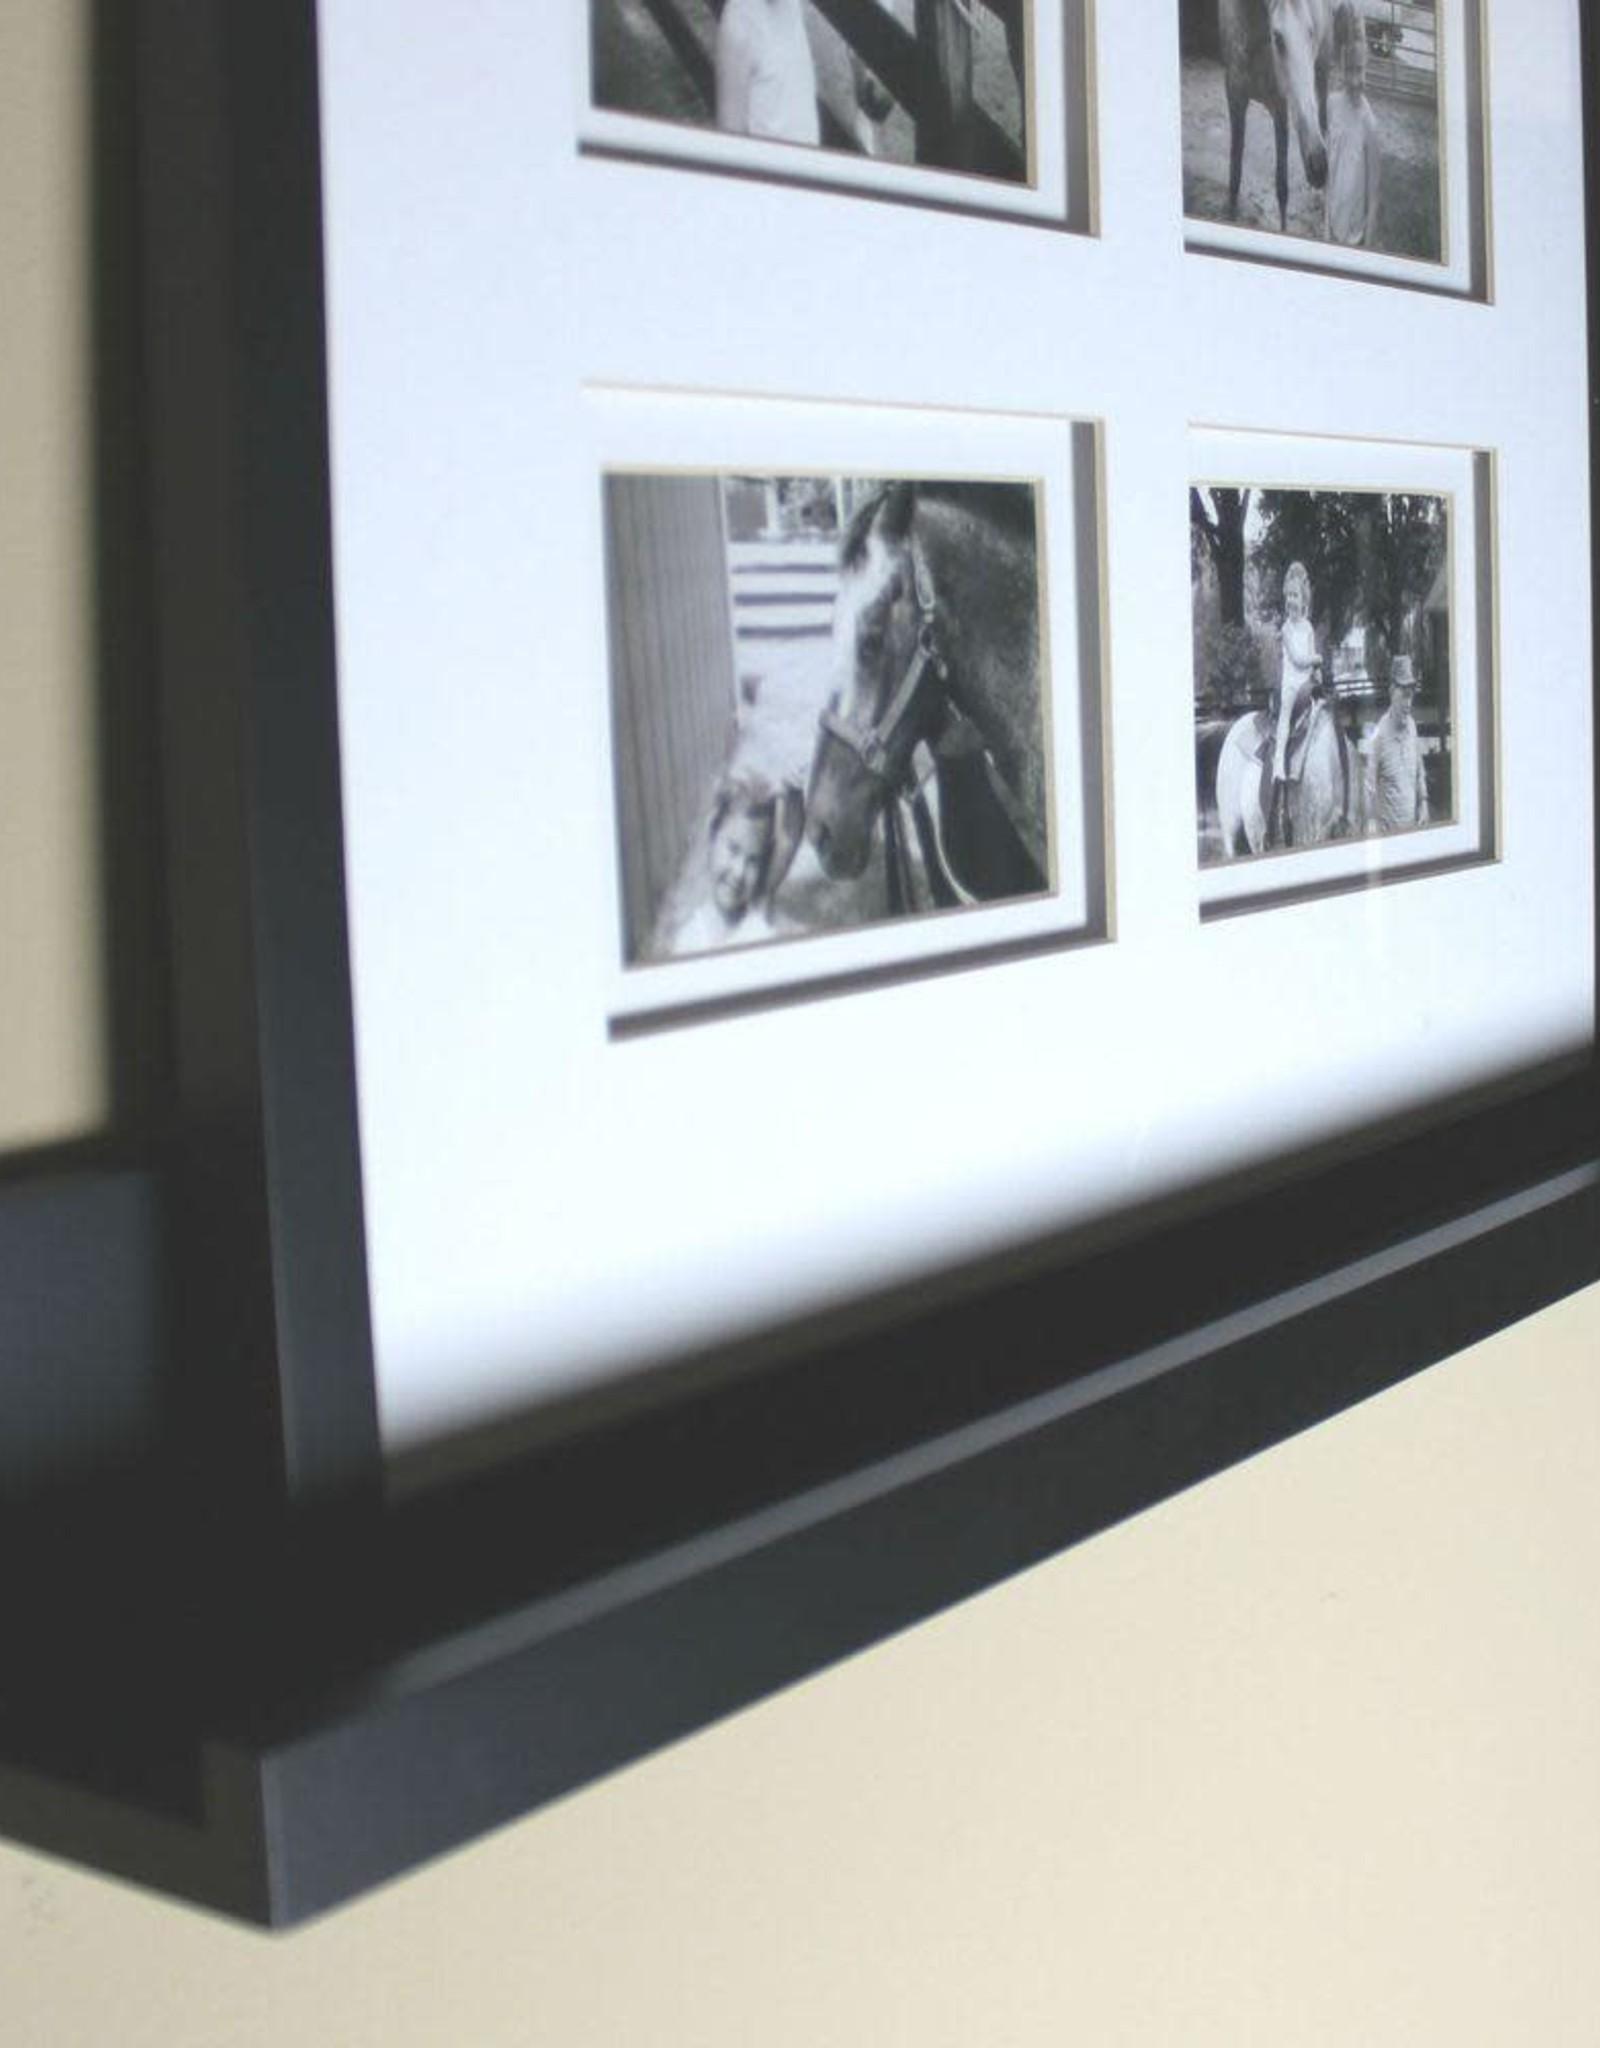 inPlace 23.6 in. W x 3.5 in. D x 4.5 in. H Black MDF Picture Ledge Wall Shelf